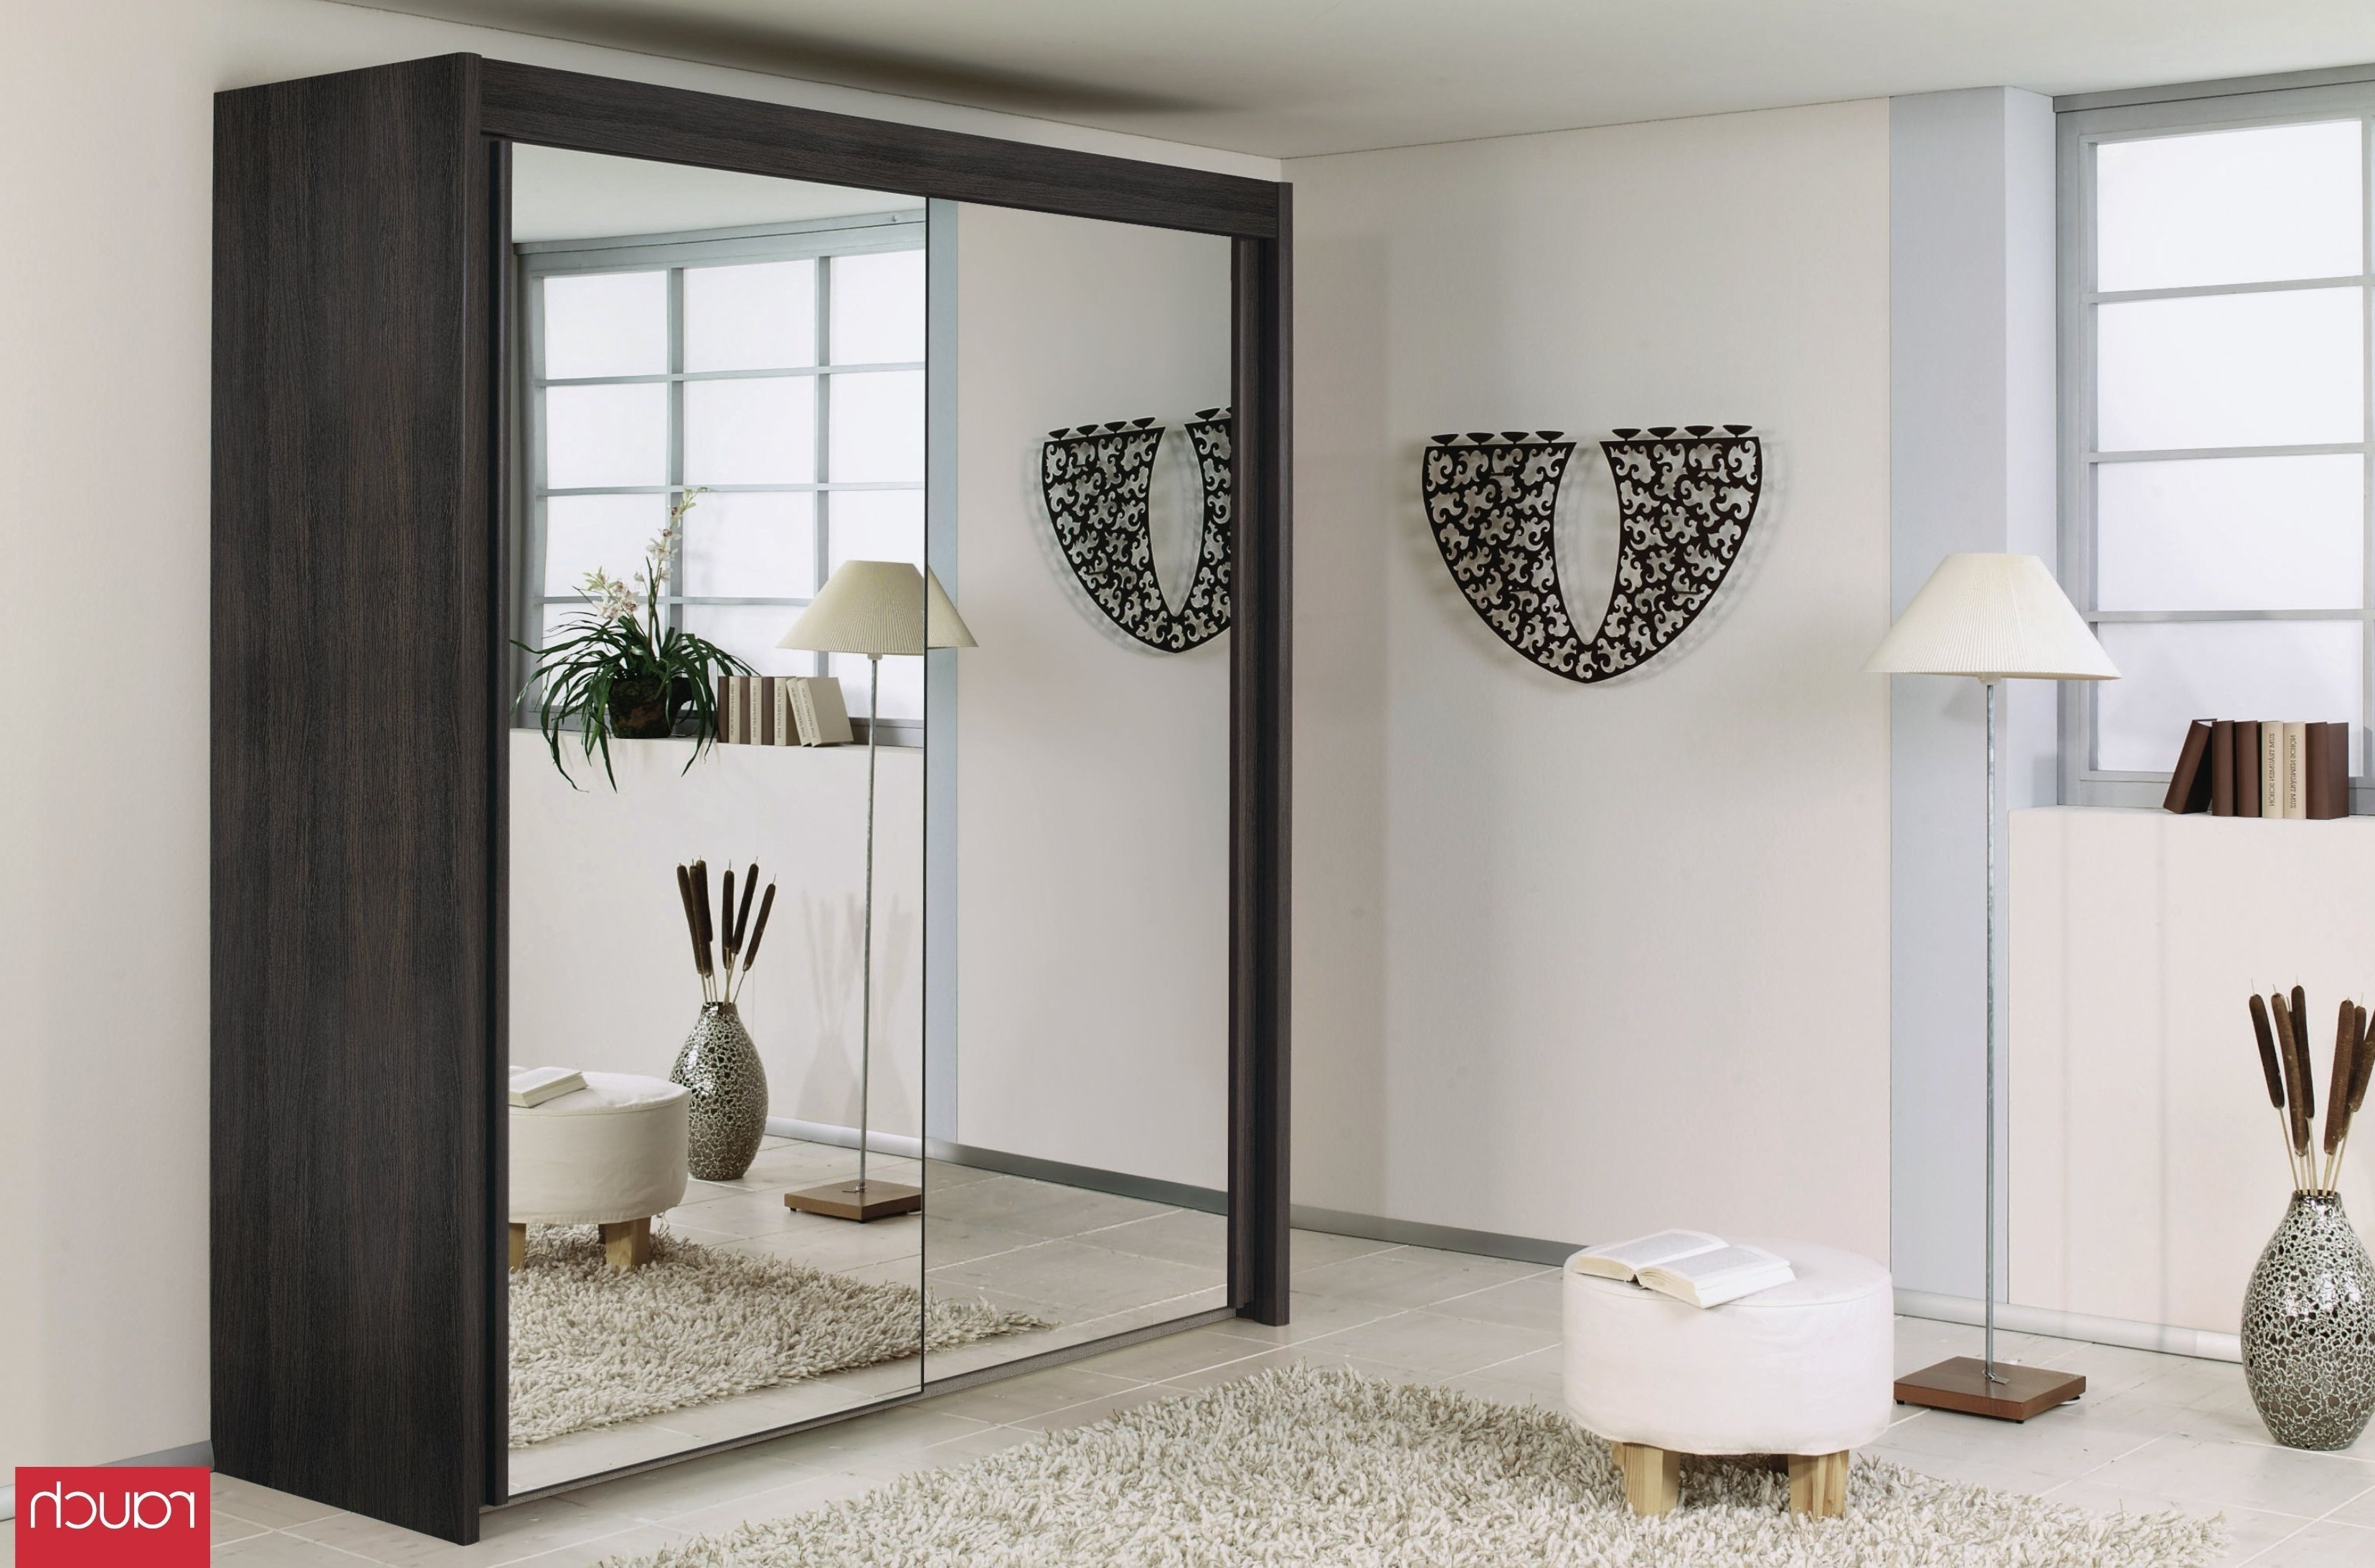 Trendy Rauch Imperial Wardrobes Regarding Rauch Imperial Wenge Shiraz 2 Door Sliding Wardrobe – W 201cm H 223cm (View 5 of 15)